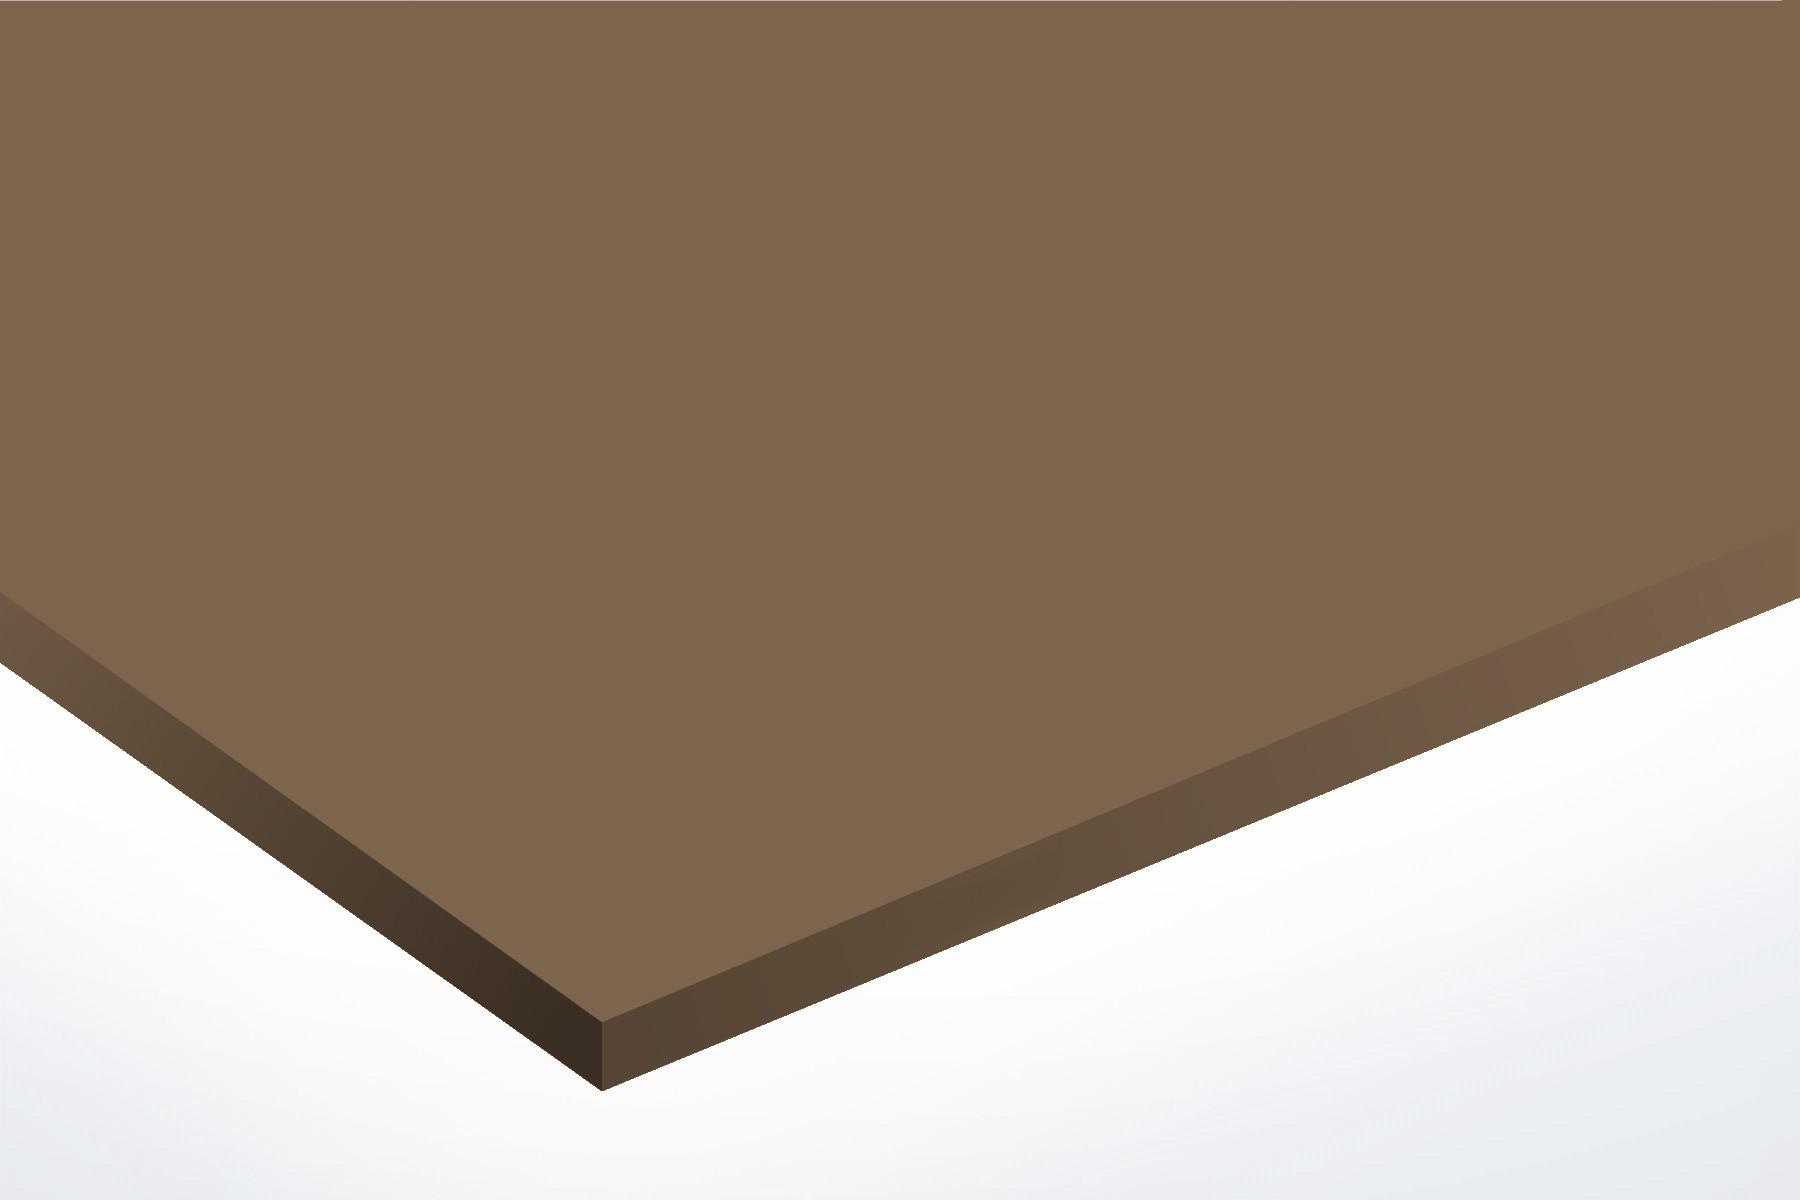 Anodised Aluminium Bronze, Matte, 0.5mm x 1000mm x 500mm